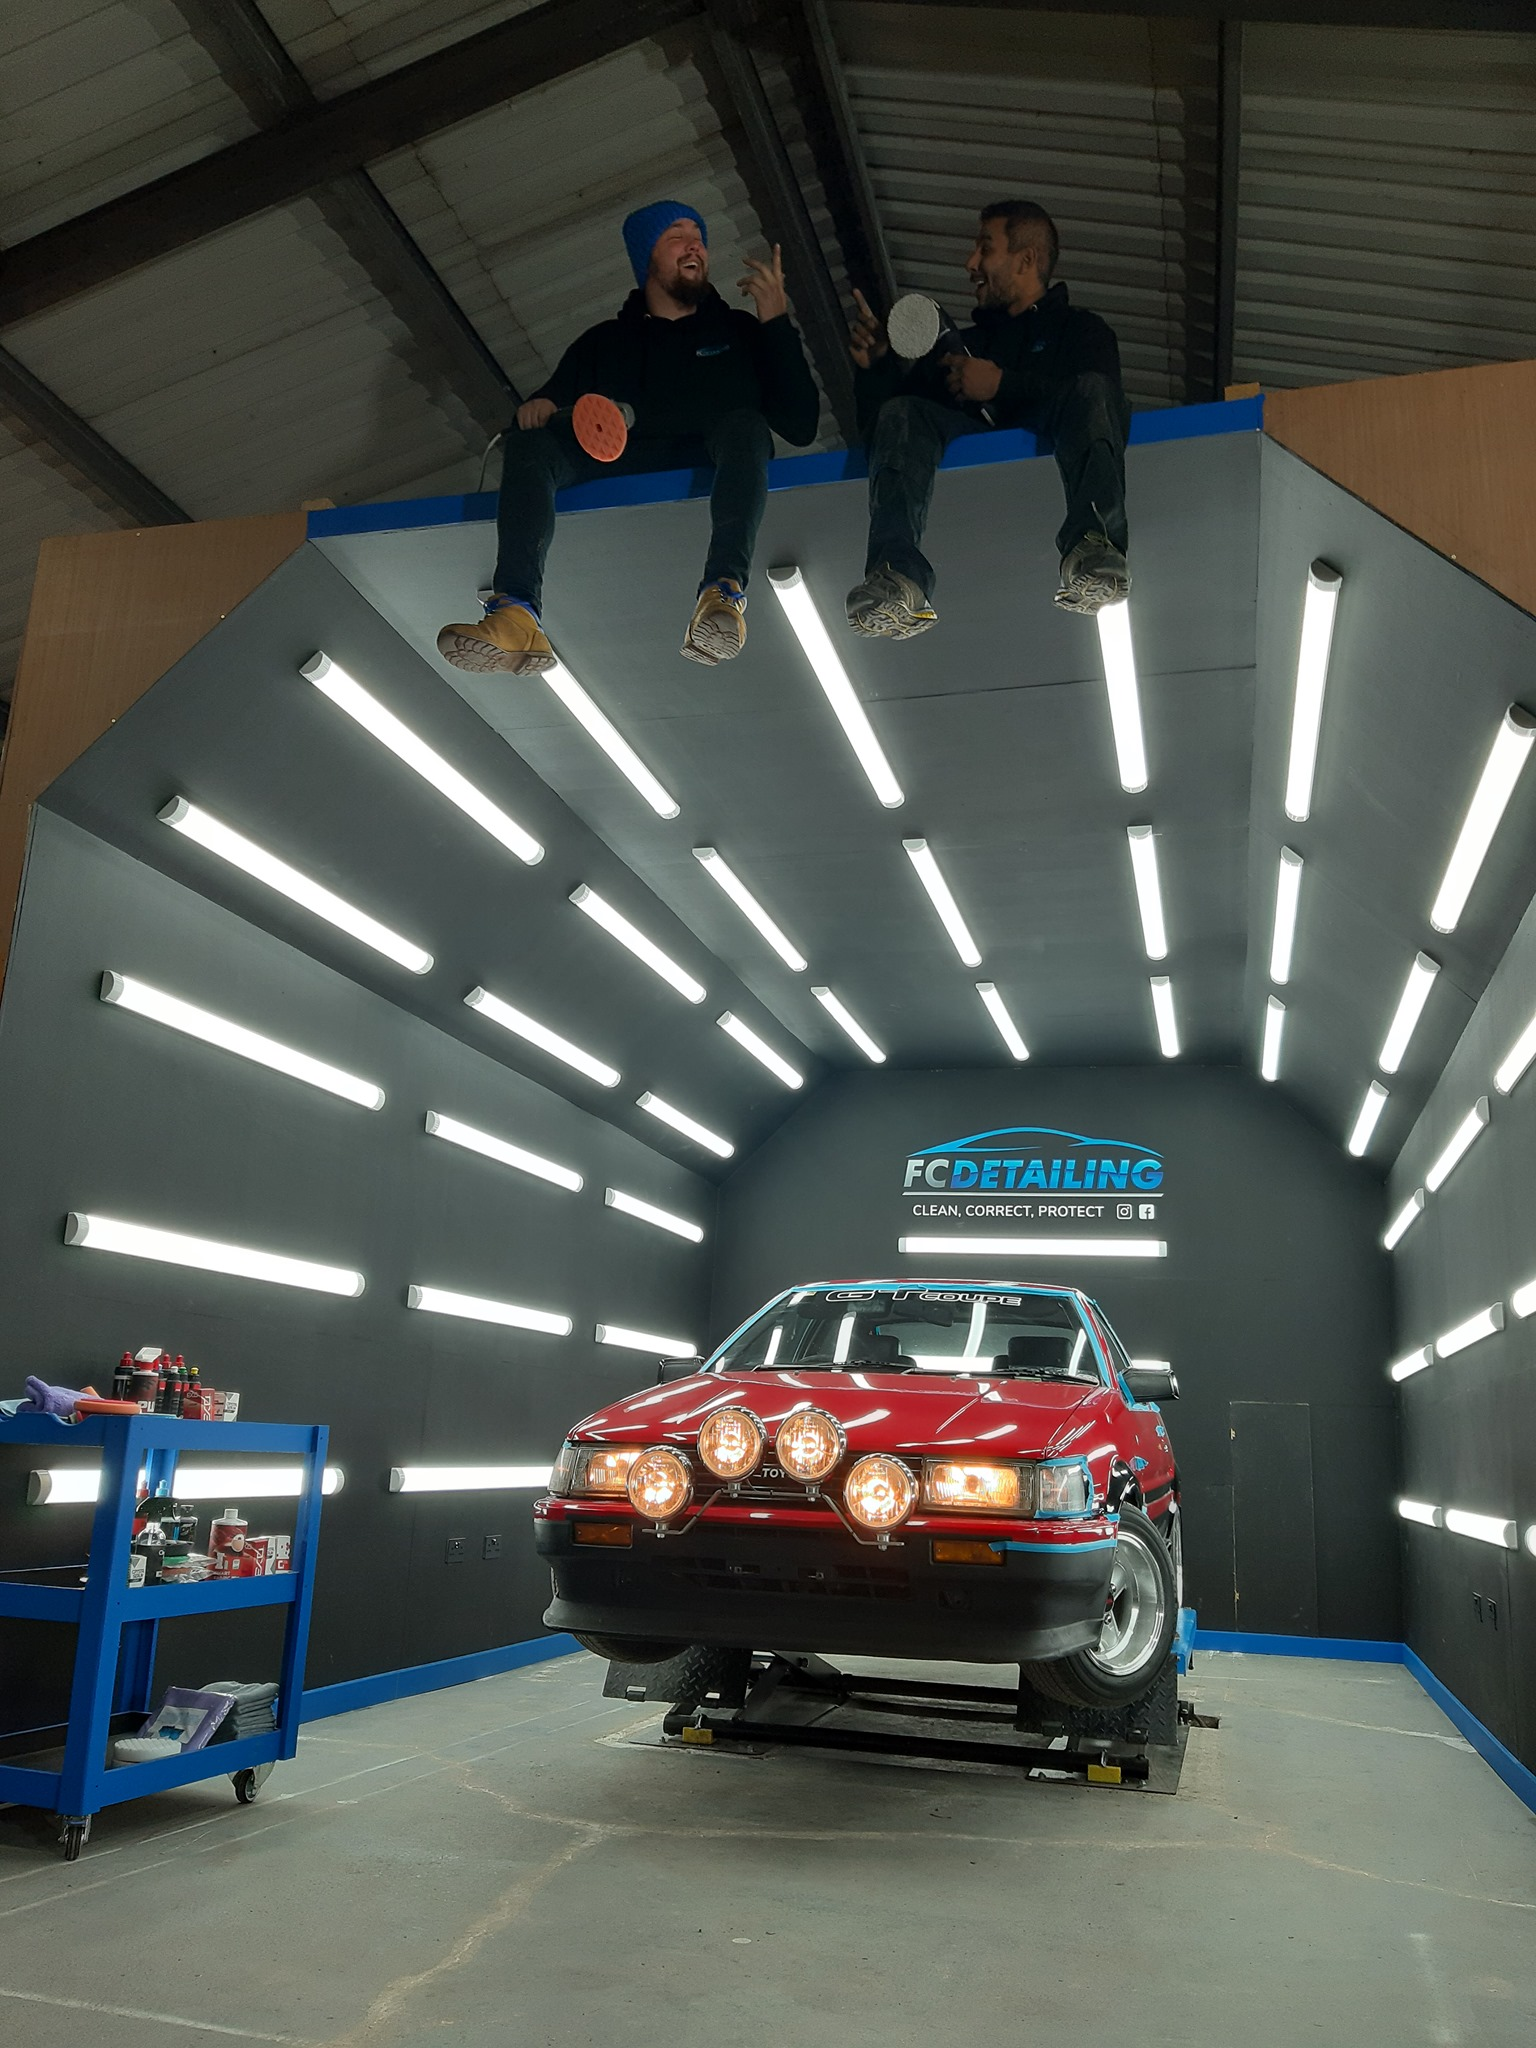 Official Ford dealership. Bandon Motors in Bandon, uselesspenguin.co.uk